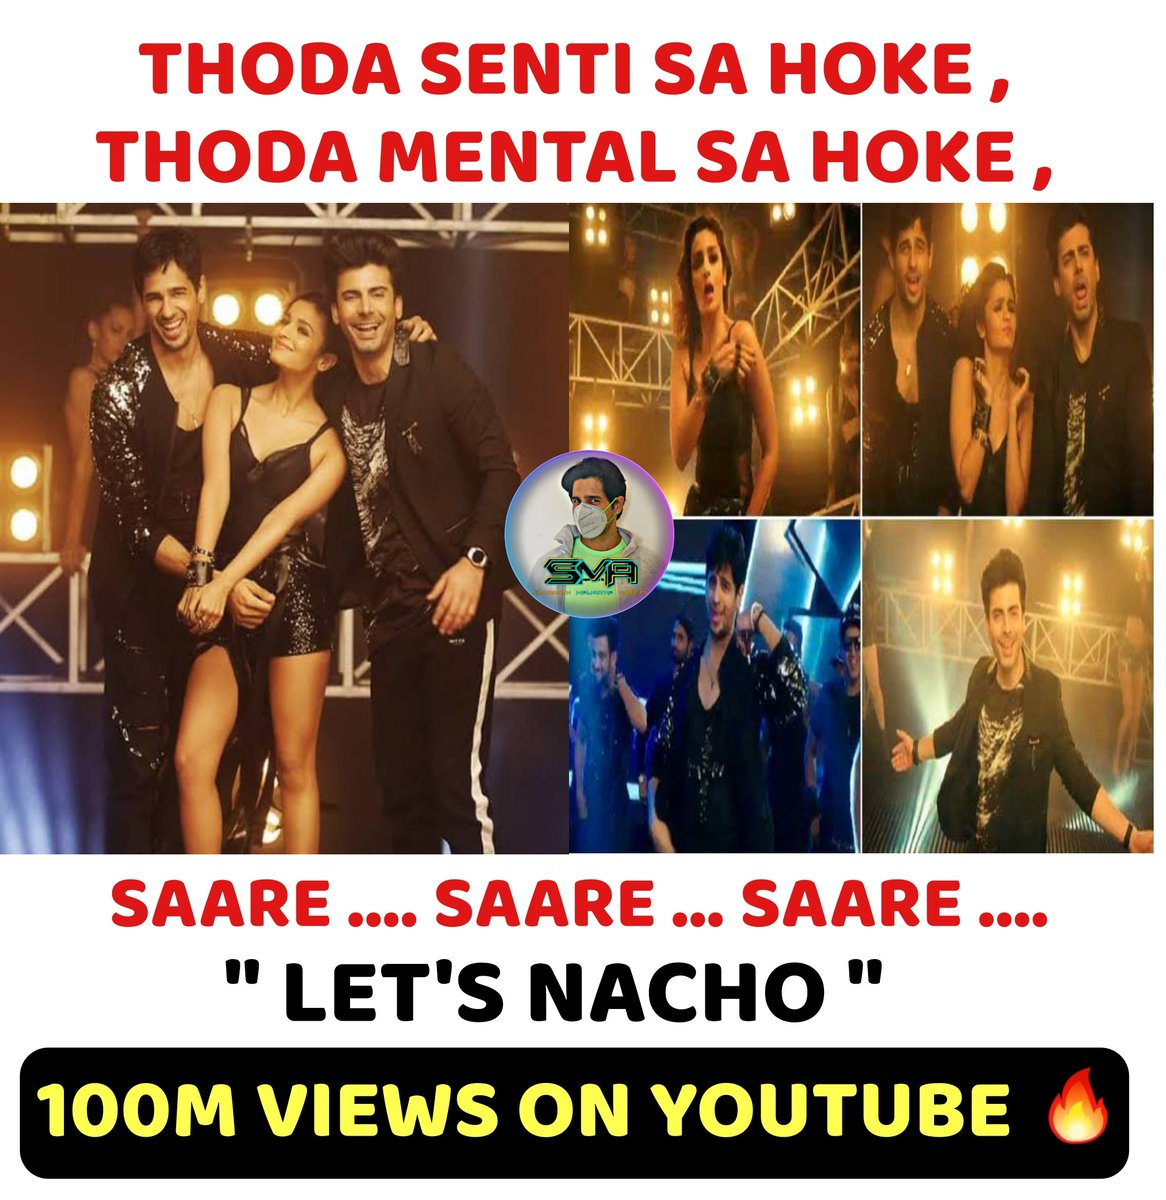 Thoda senti sa hoke, thoda mental sa hoke, saare #LetsNacho because it's 100M views on #Youtube!💃  #KapoorAndSons @karanjohar @apoorvamehta18 @sidmalhotra @aliaa08 #FawadKhan @shakunbatra @foxstarhindi @sonymusicindia @Its_Badshah @nucleya @benny_dayal